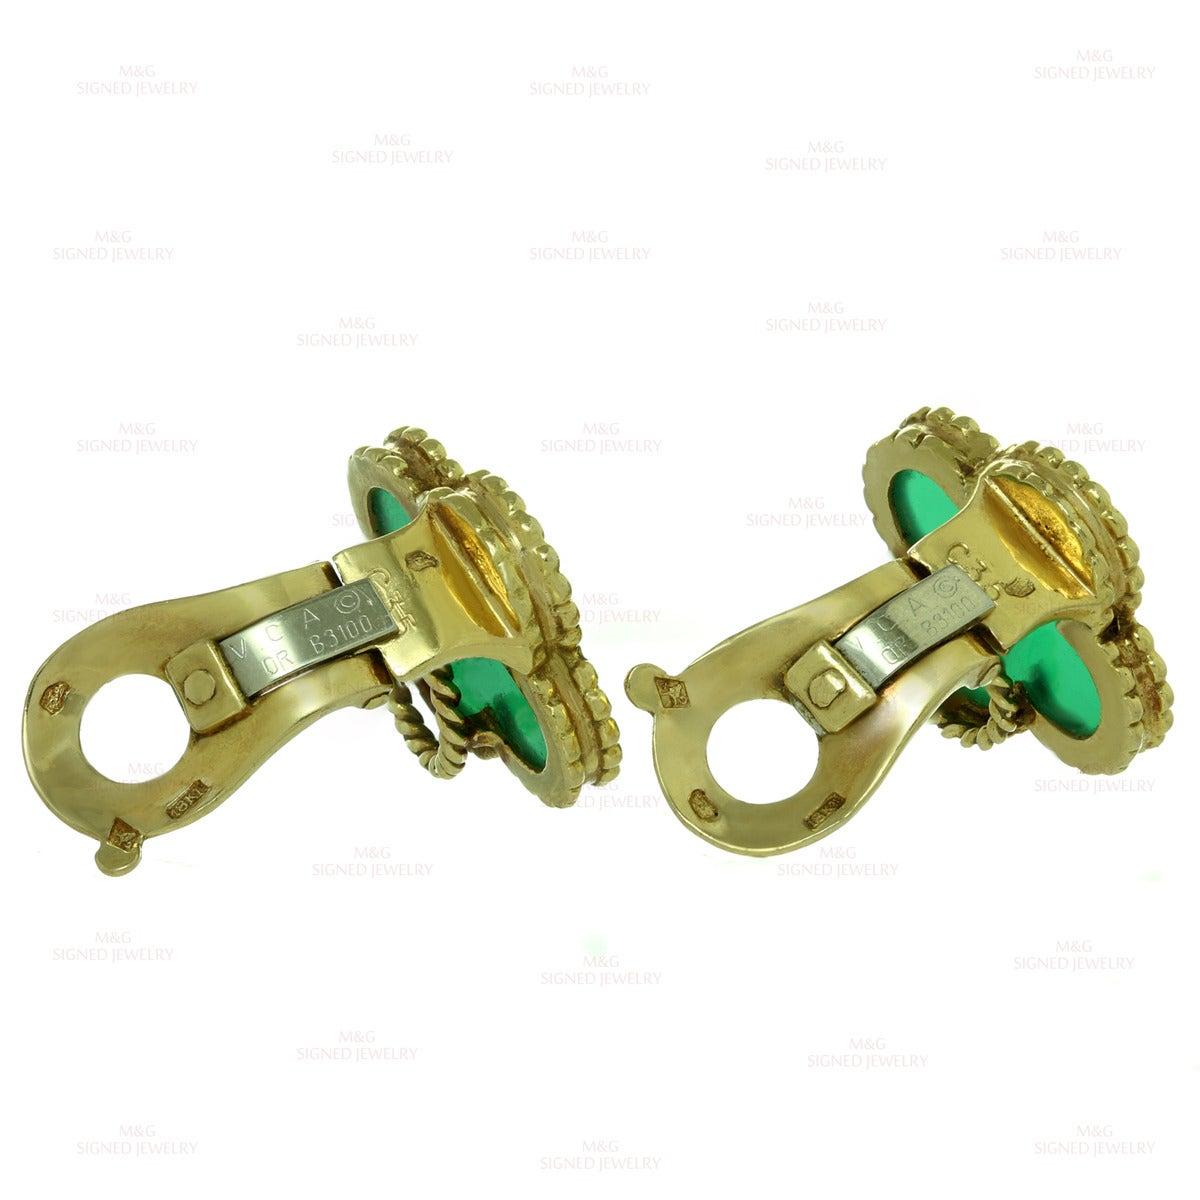 1970s Van Cleef & Arpels Alhambra Green Chalcedony Gold Earrings 4